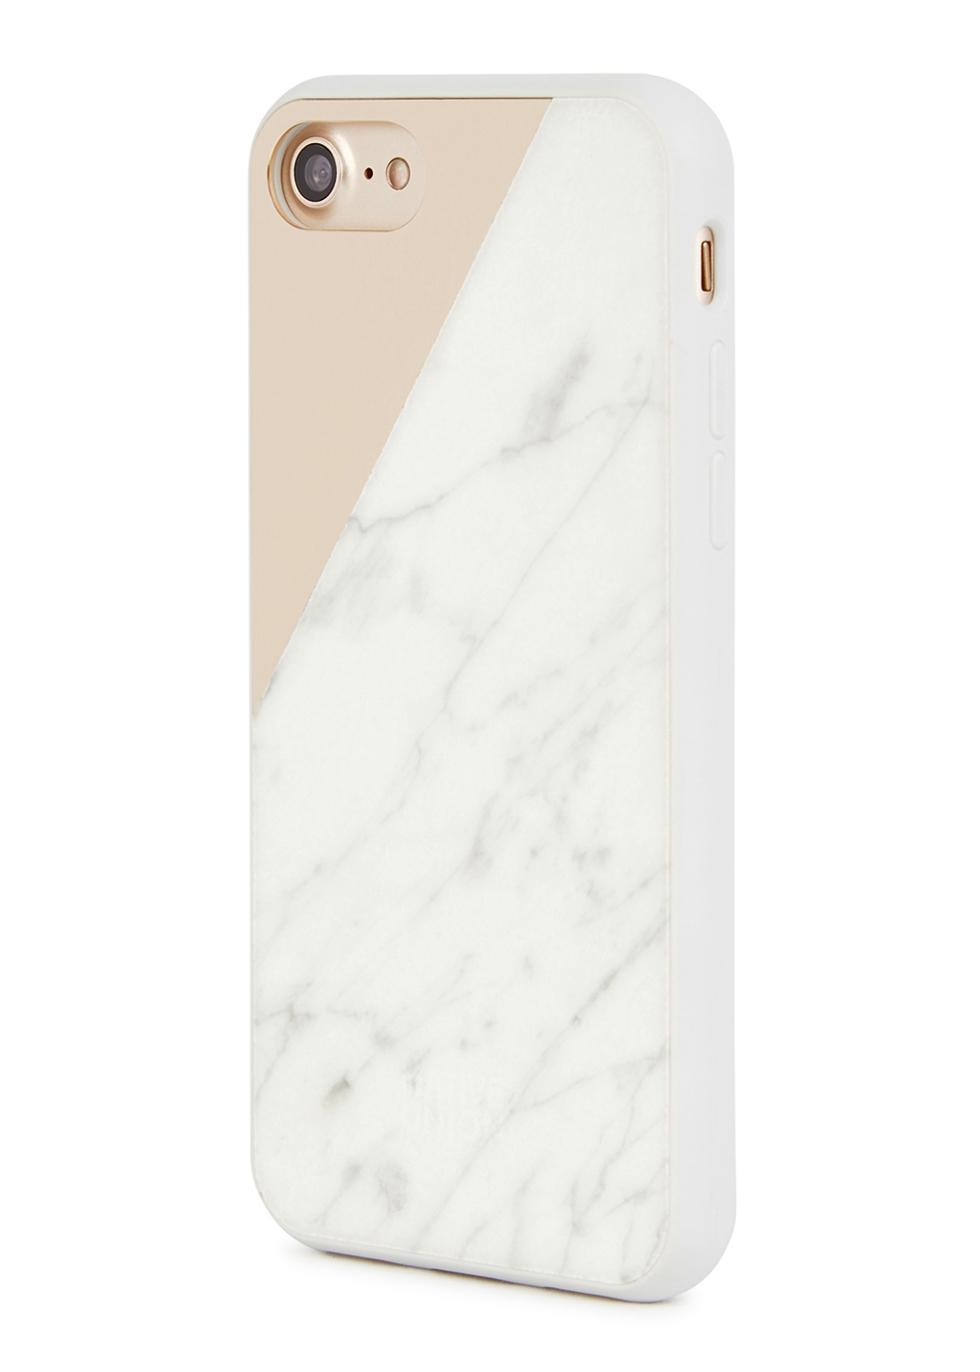 CLIC Marble iPhone 7 case - Native Union